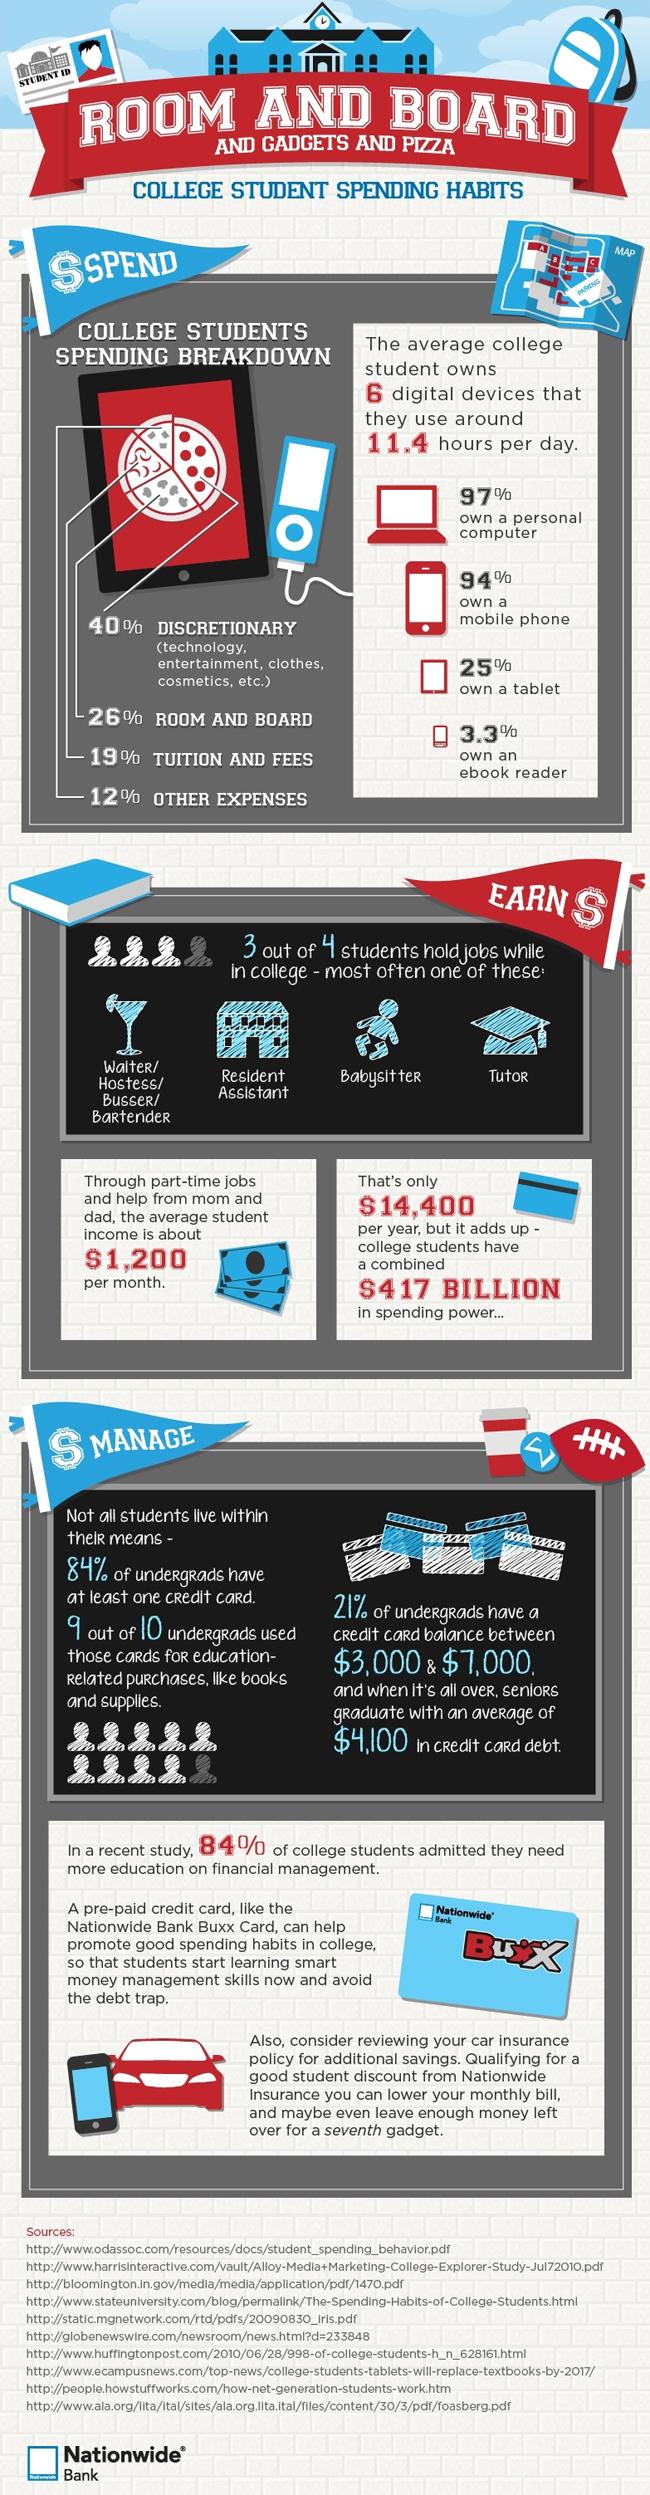 College Student Spending Habits